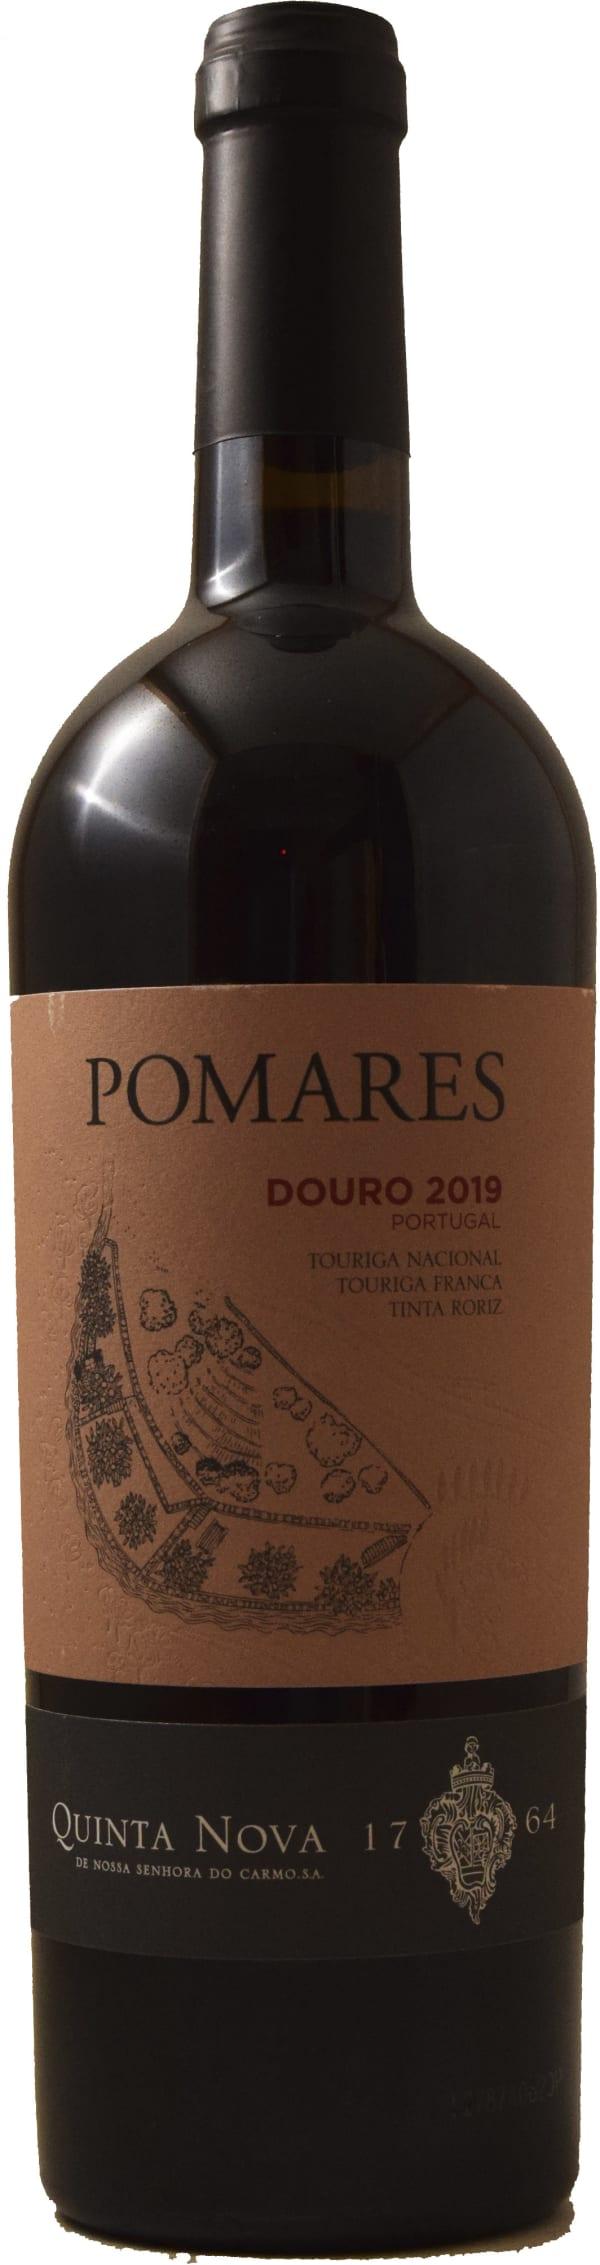 Quinta Nova Pomares 2018